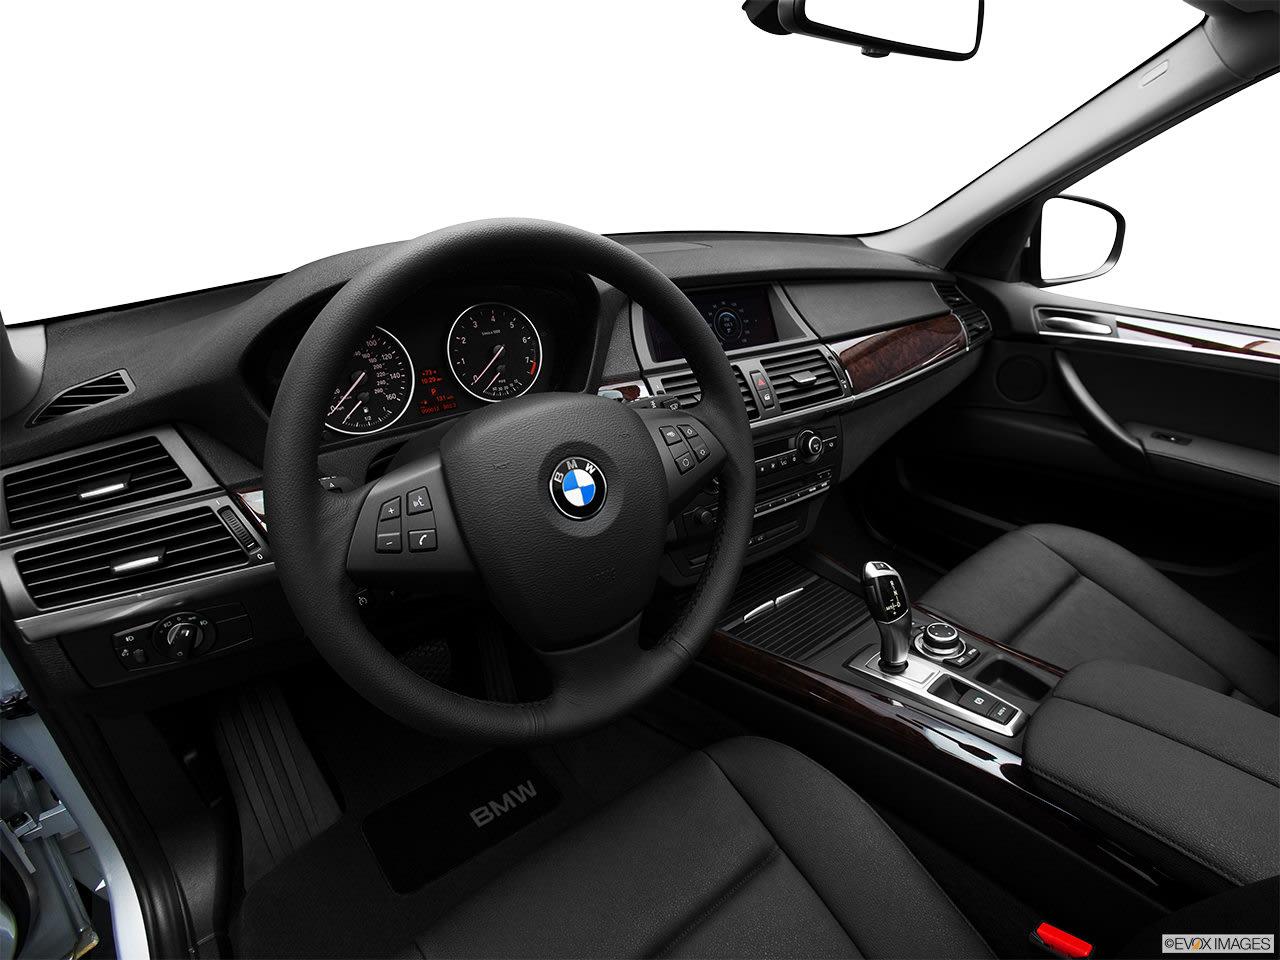 BMW X5 xDrive35d Interior